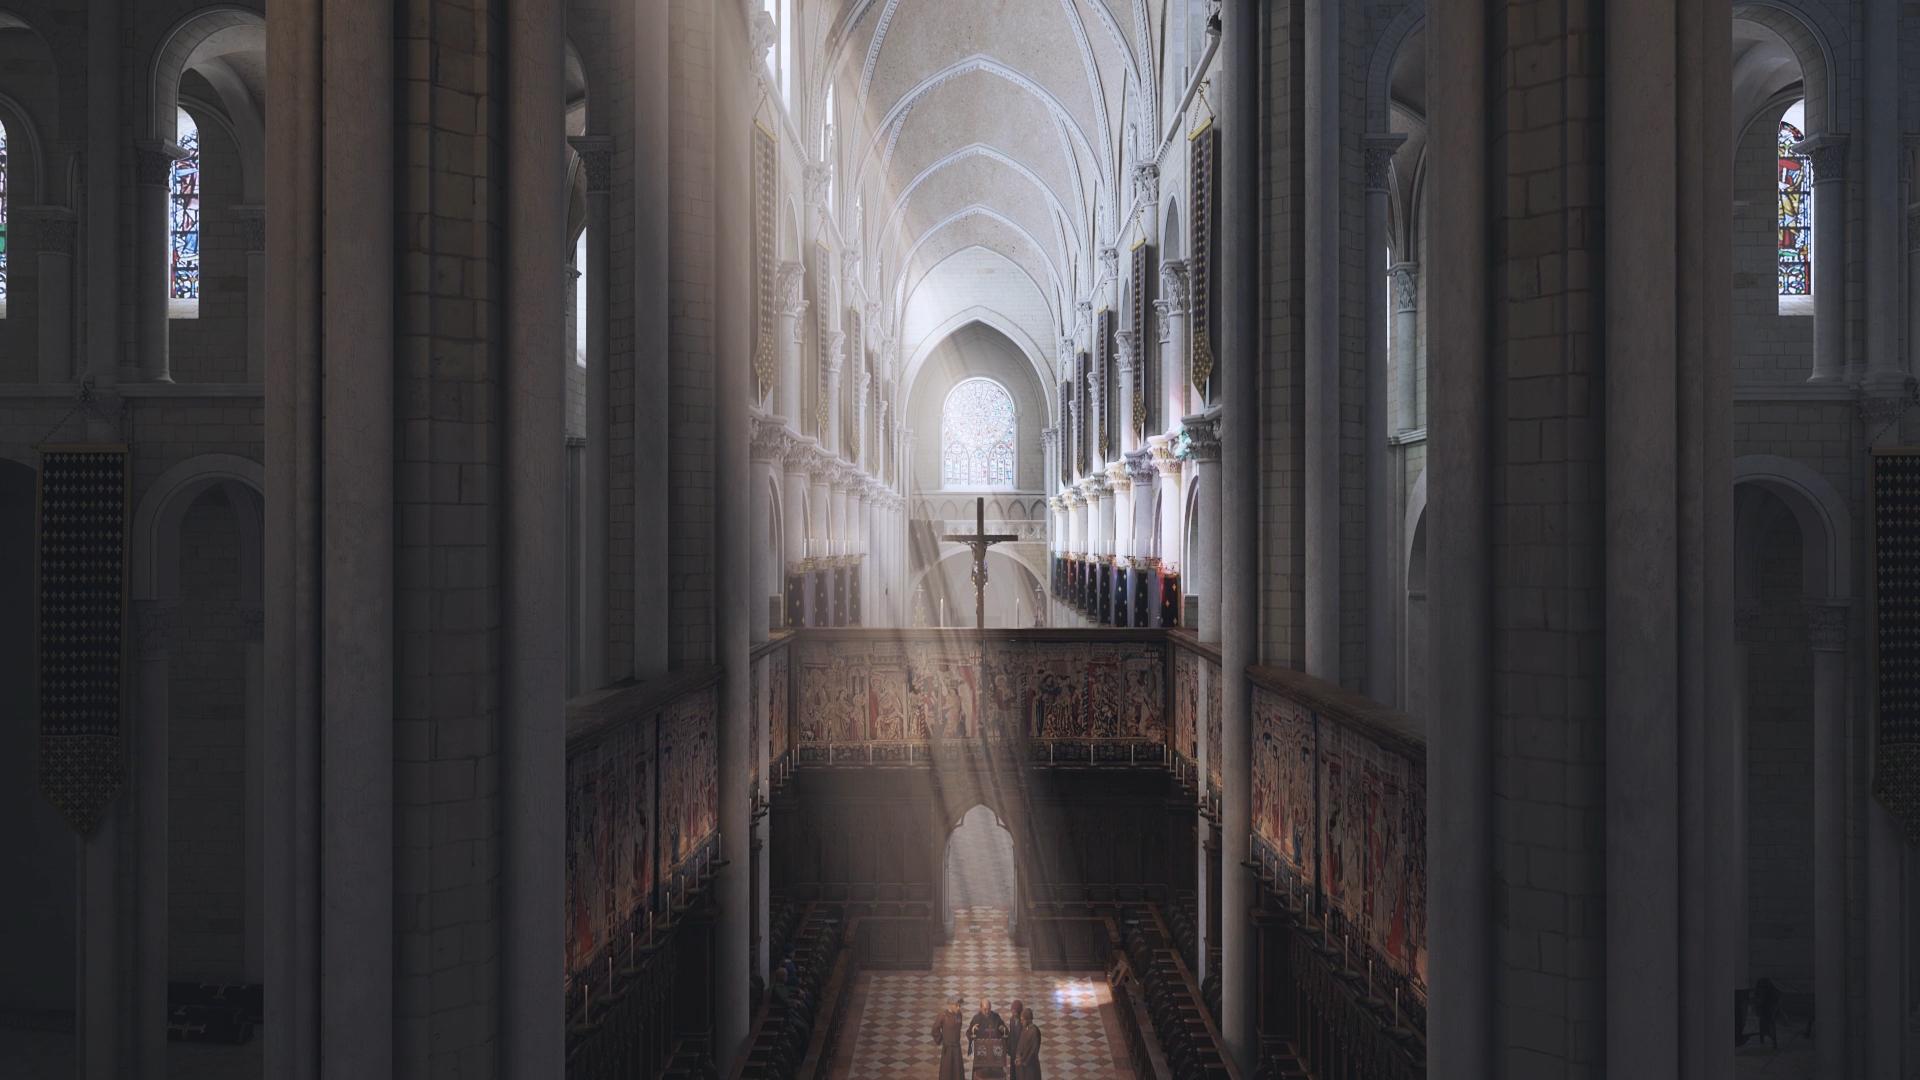 GALERIE-Dripmoon-Studio 3D-Tours-Reconstitution-Patrimoine-REVIS MARTIN (43) copie